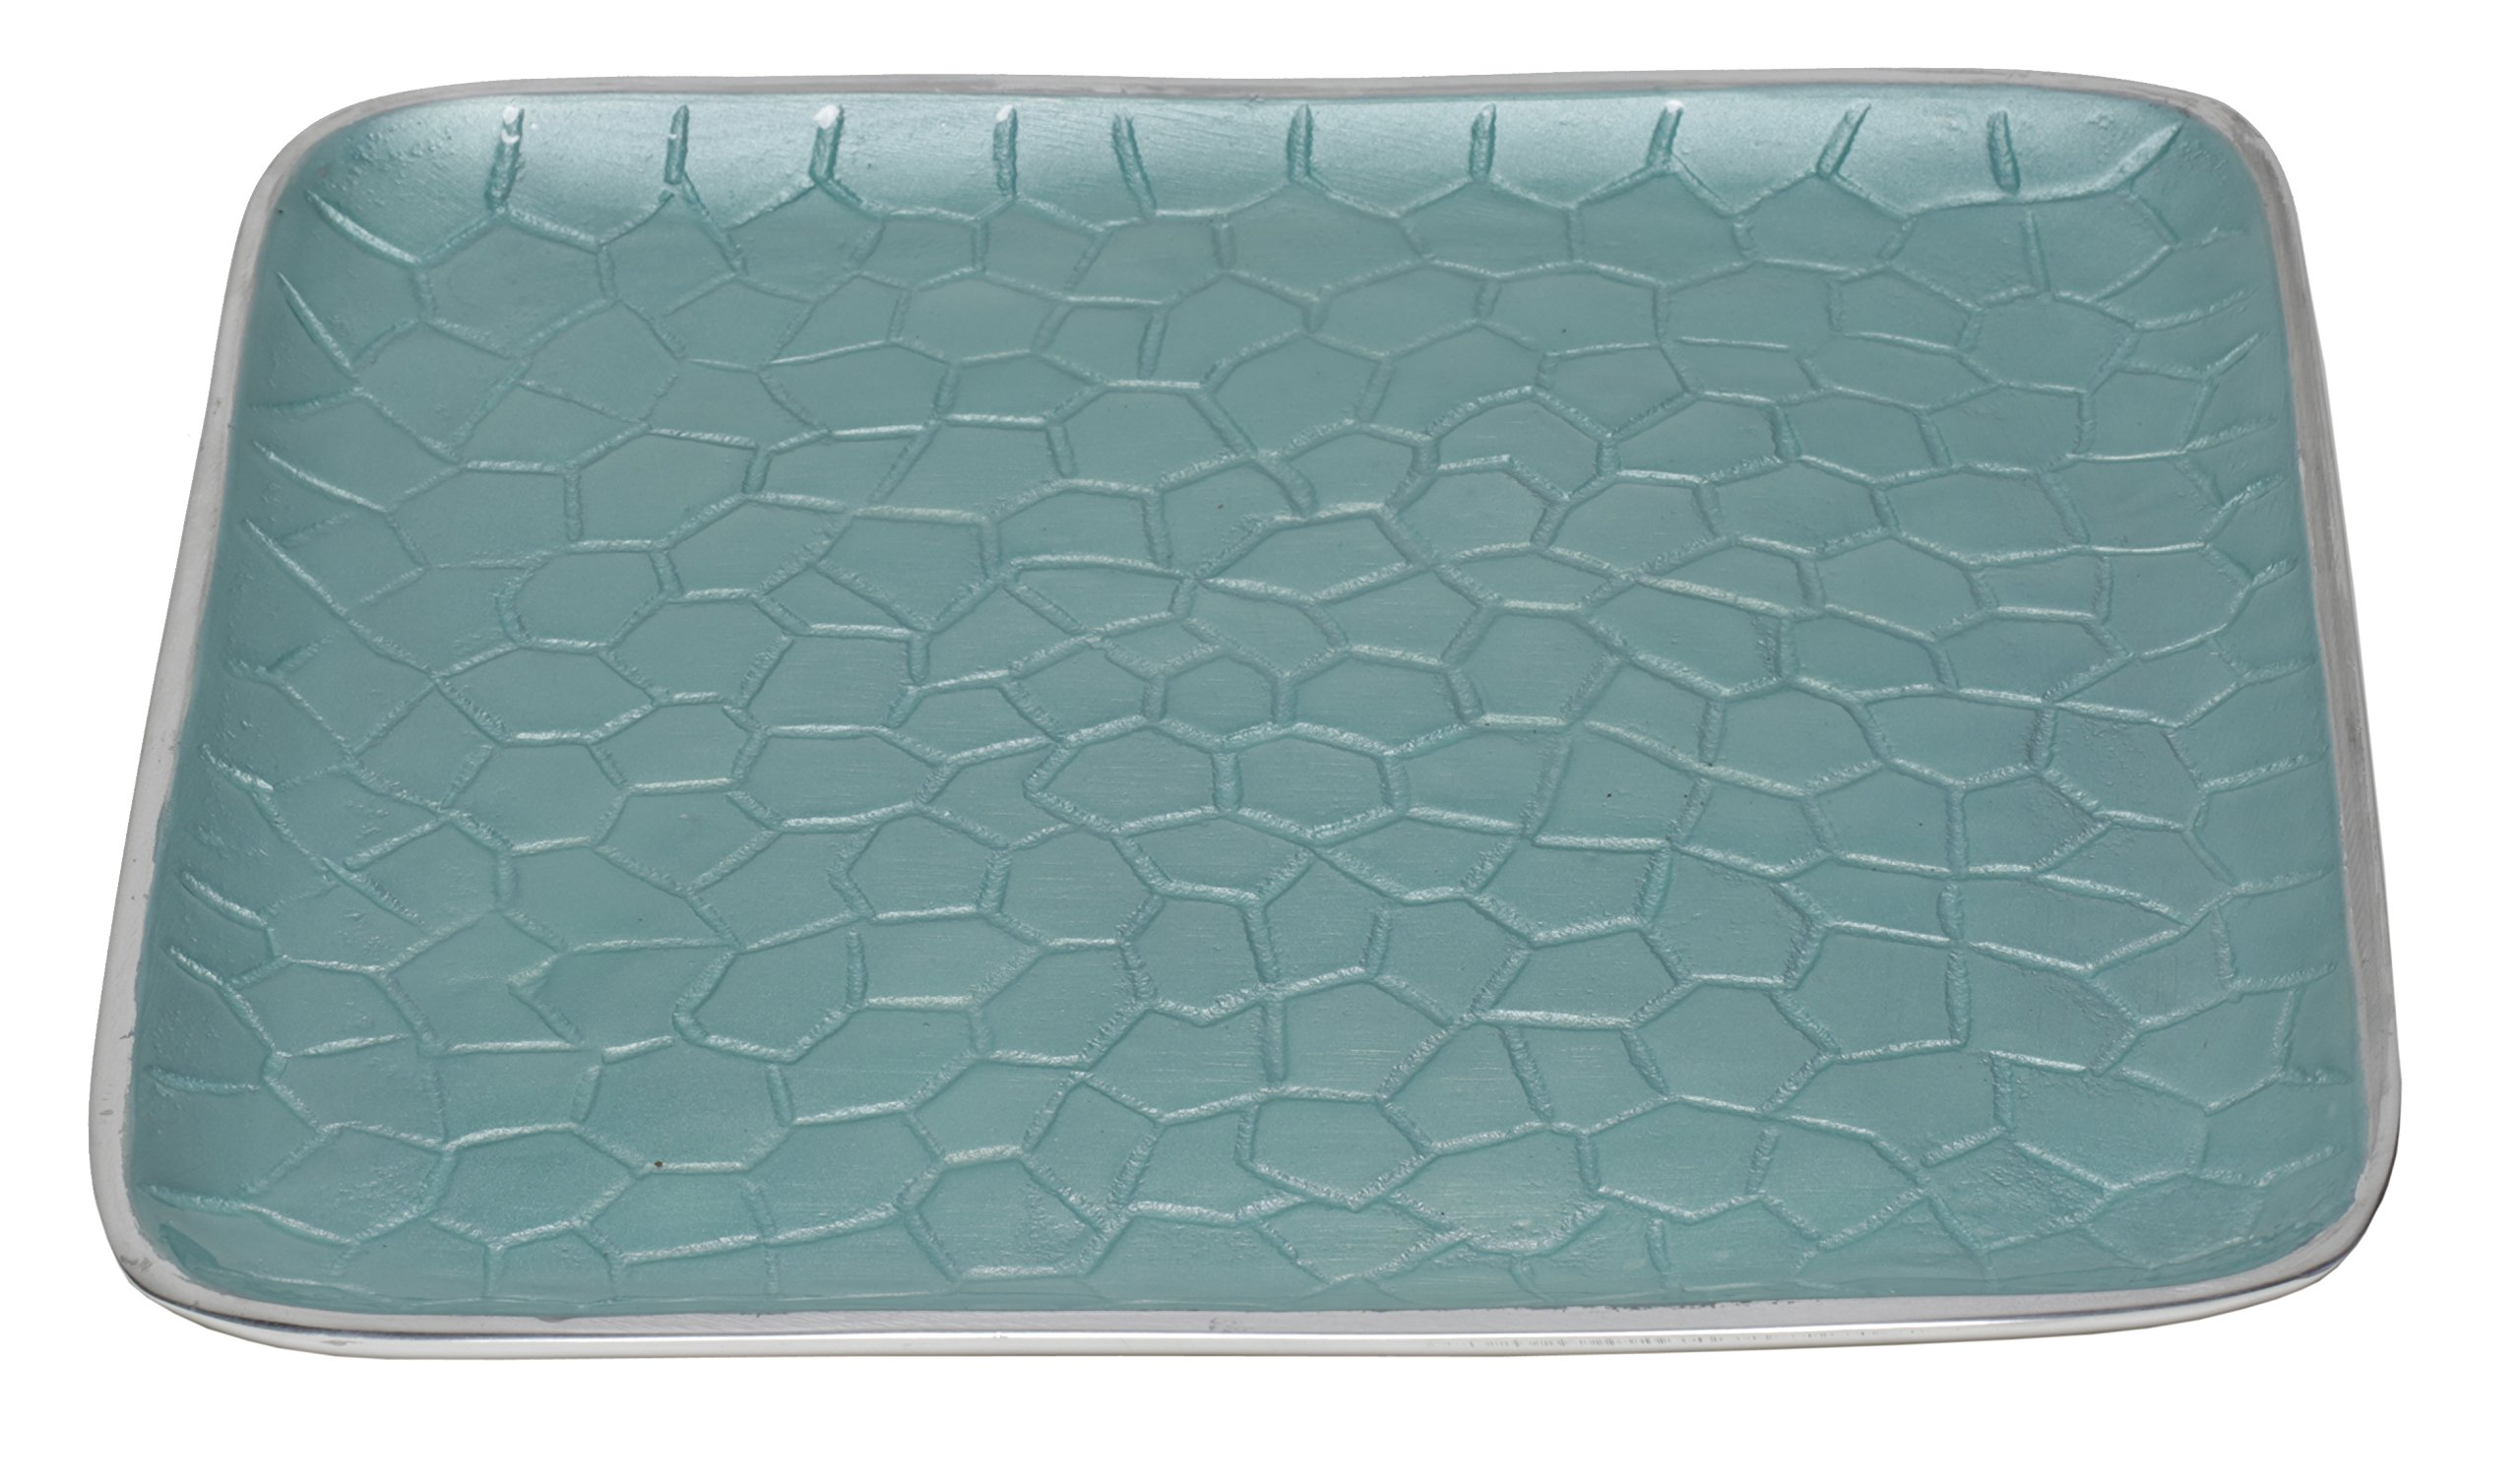 Artisan d'Orient Classic 8'' Square Tray, Color - Aqua, Set of 4